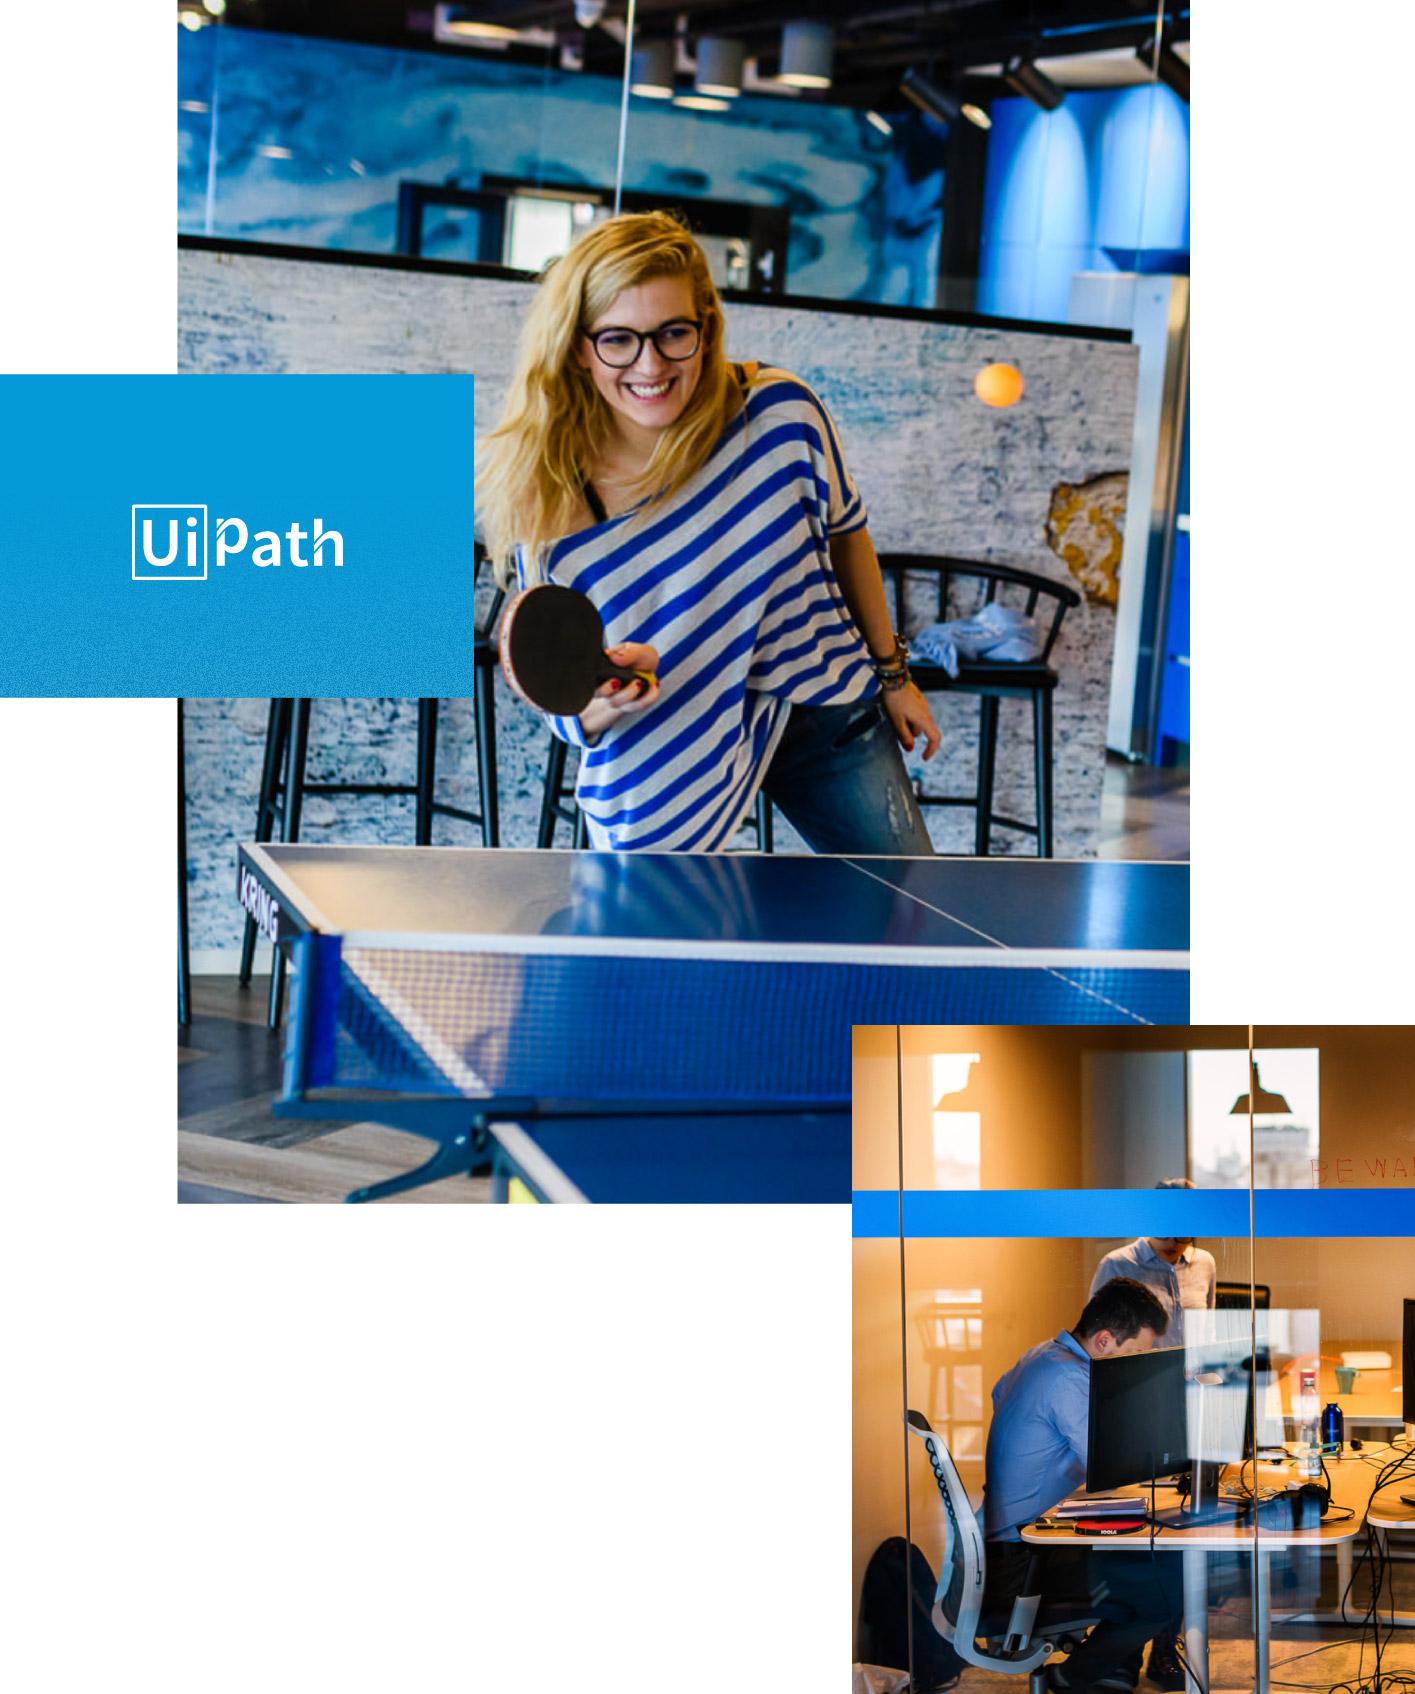 UiPath-Recruitment